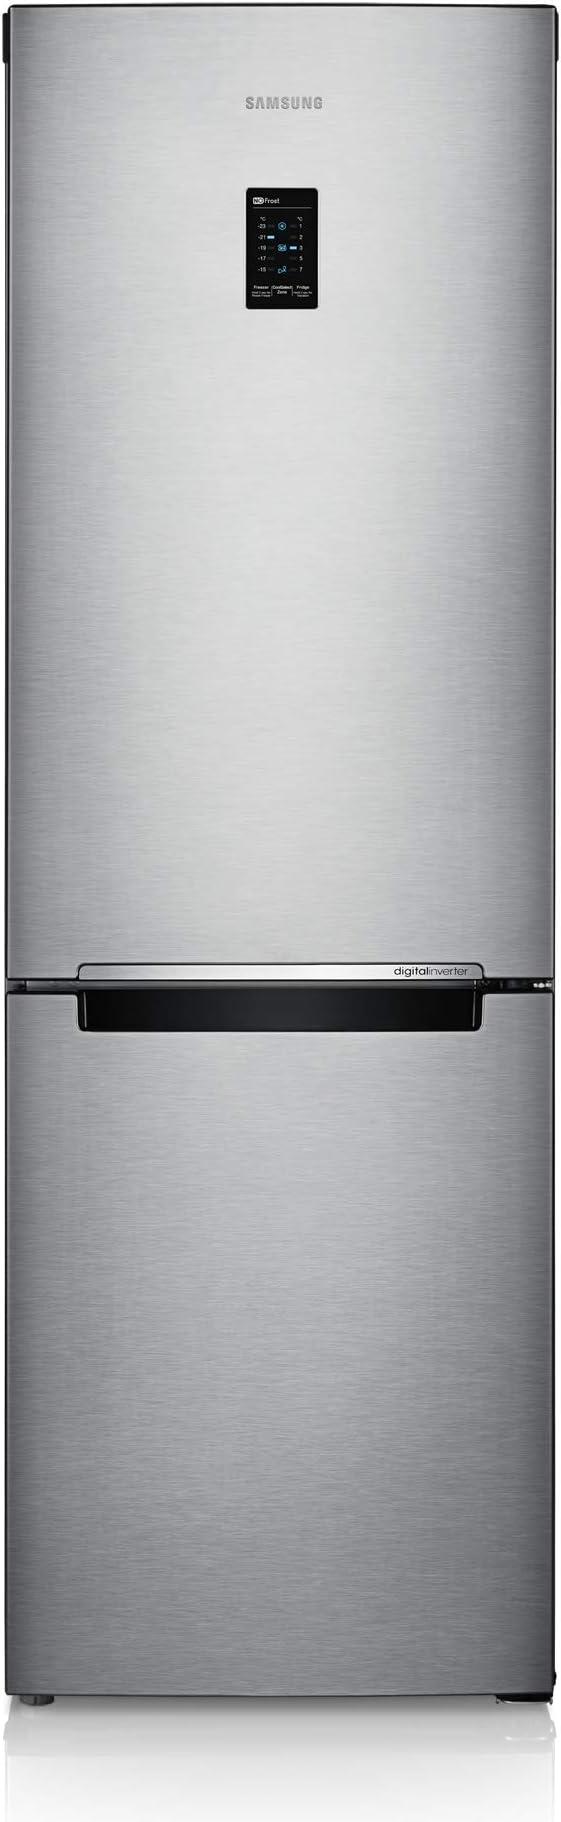 Samsung RB31FERNCSA Independiente Acero inoxidable 206L 98L A++ ...